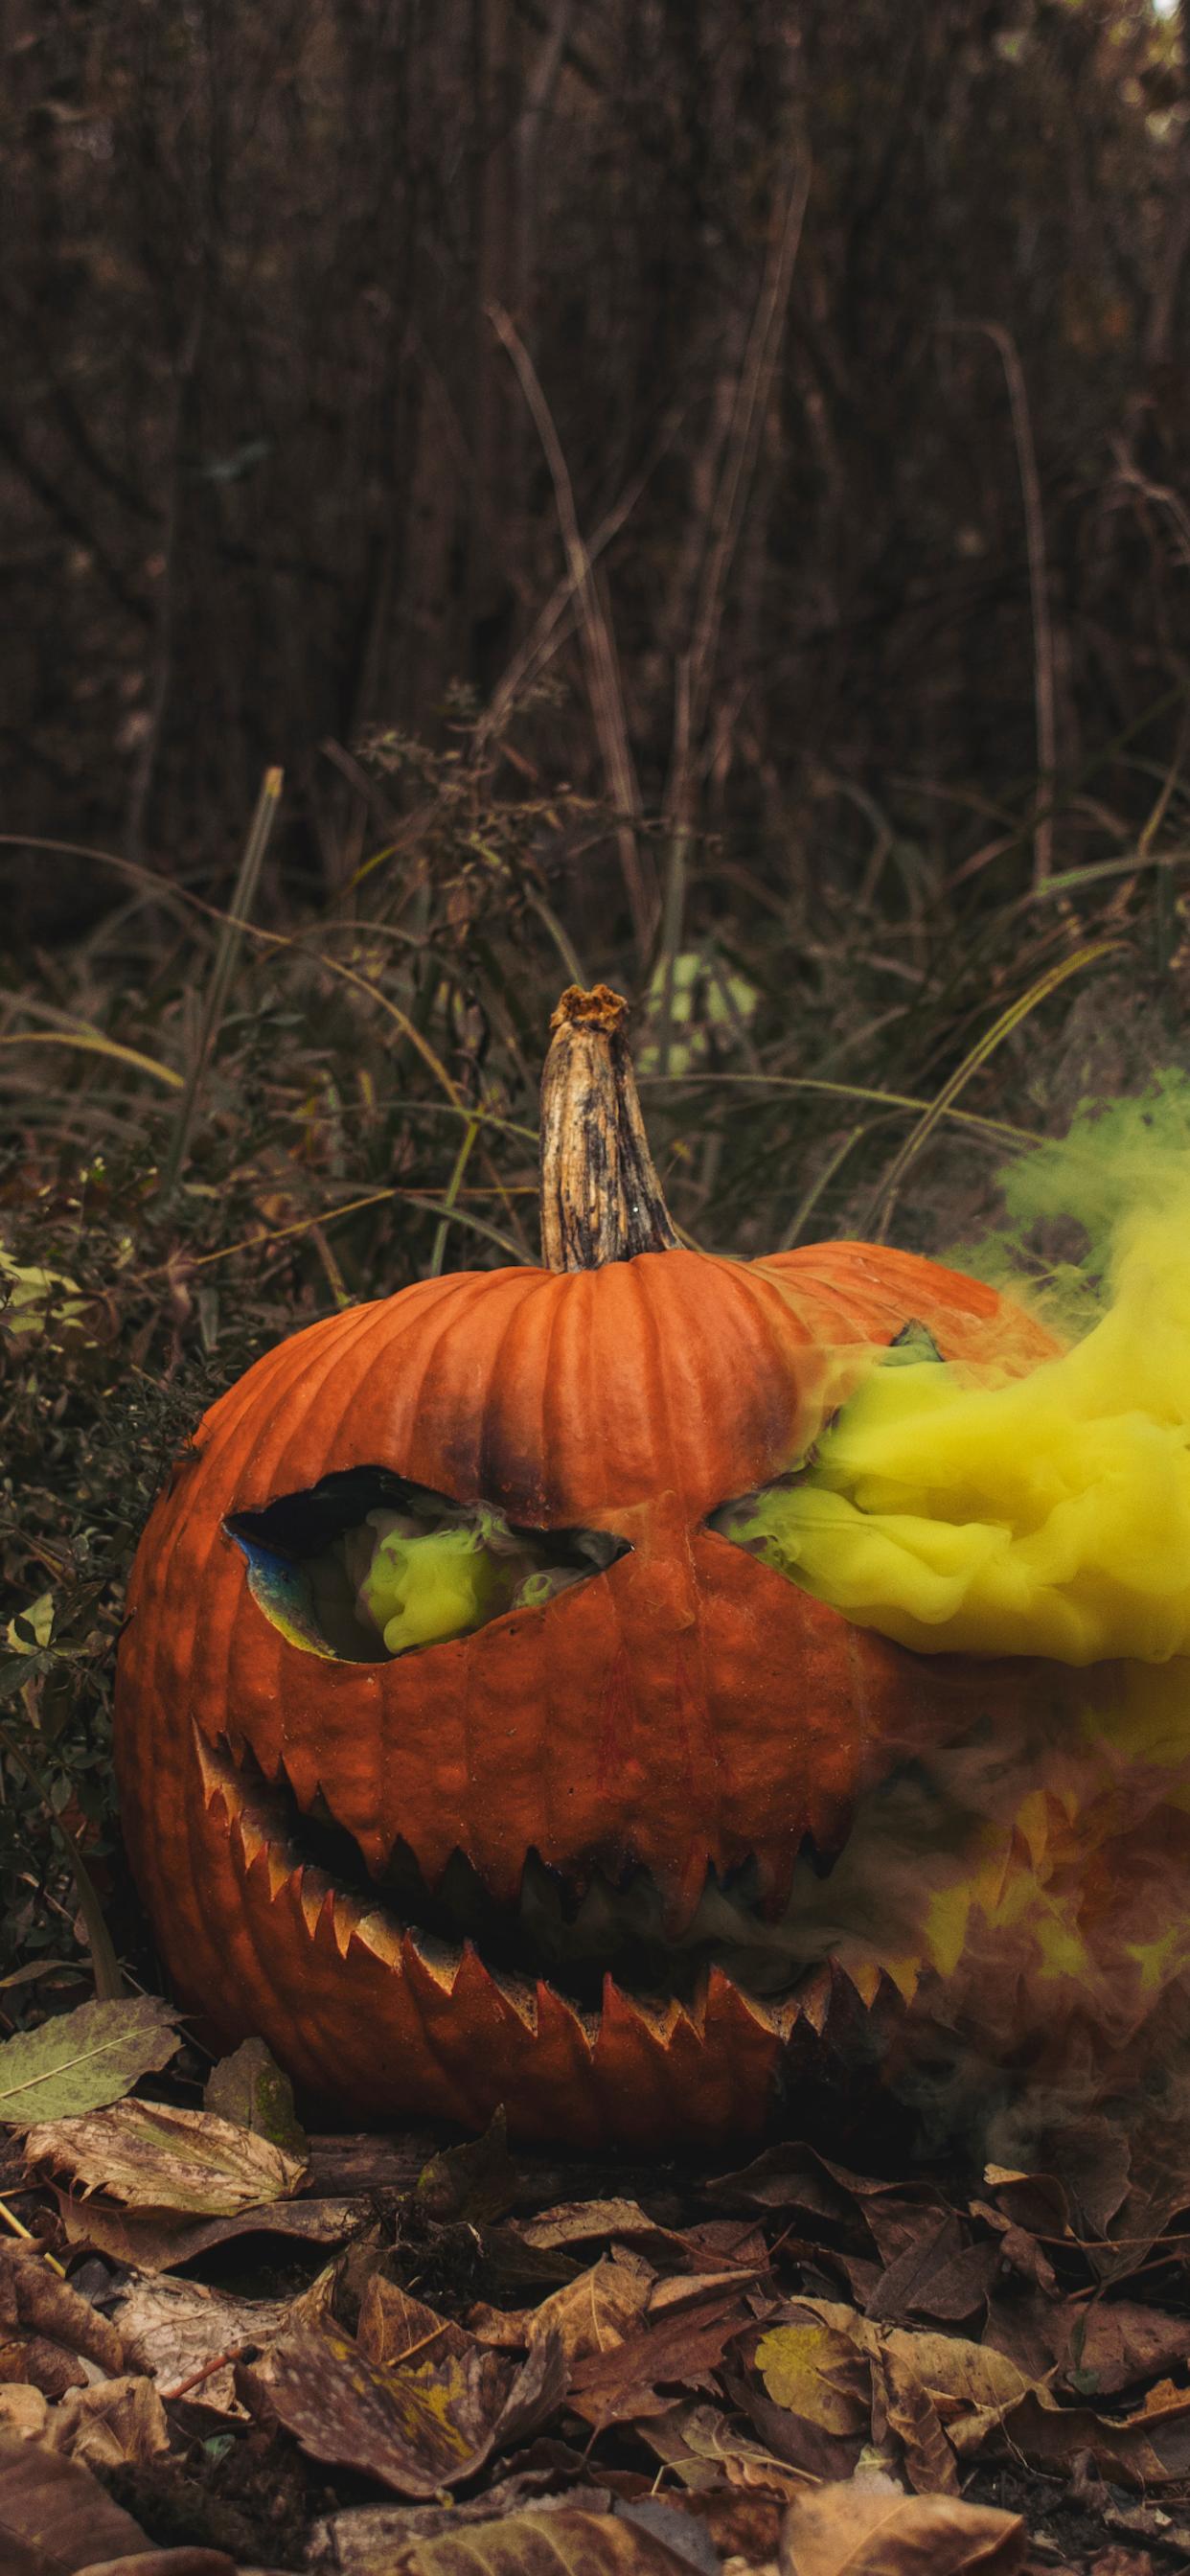 iPhone wallpapers halloween pumpkin orange Fonds d'écran iPhone du 31/10/2019